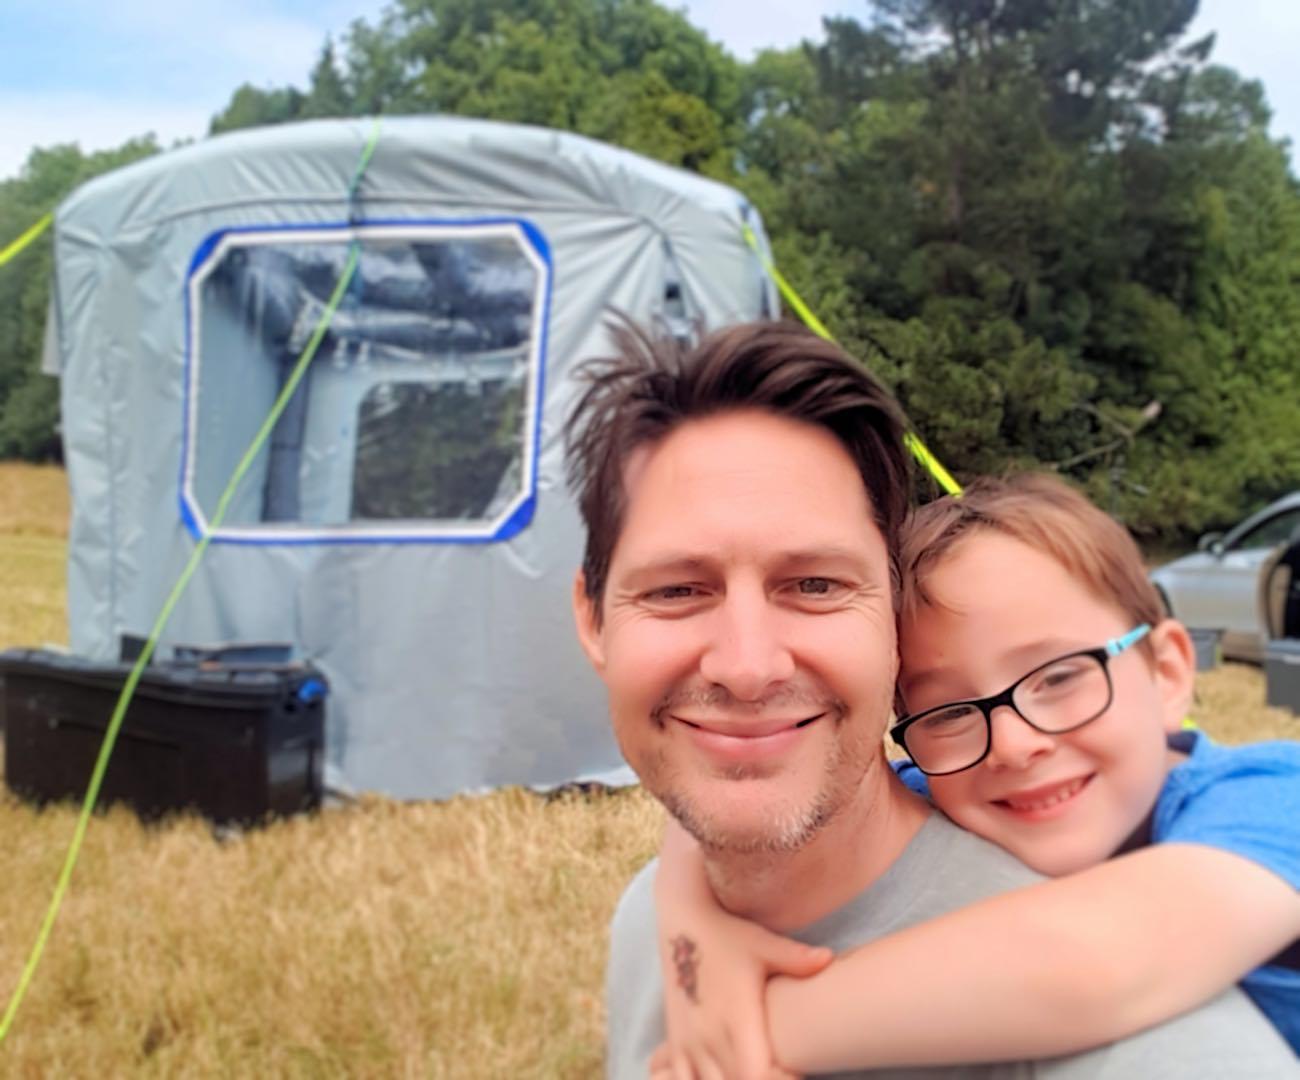 Mi-Camp ONE Modular Easy Pitch Tent